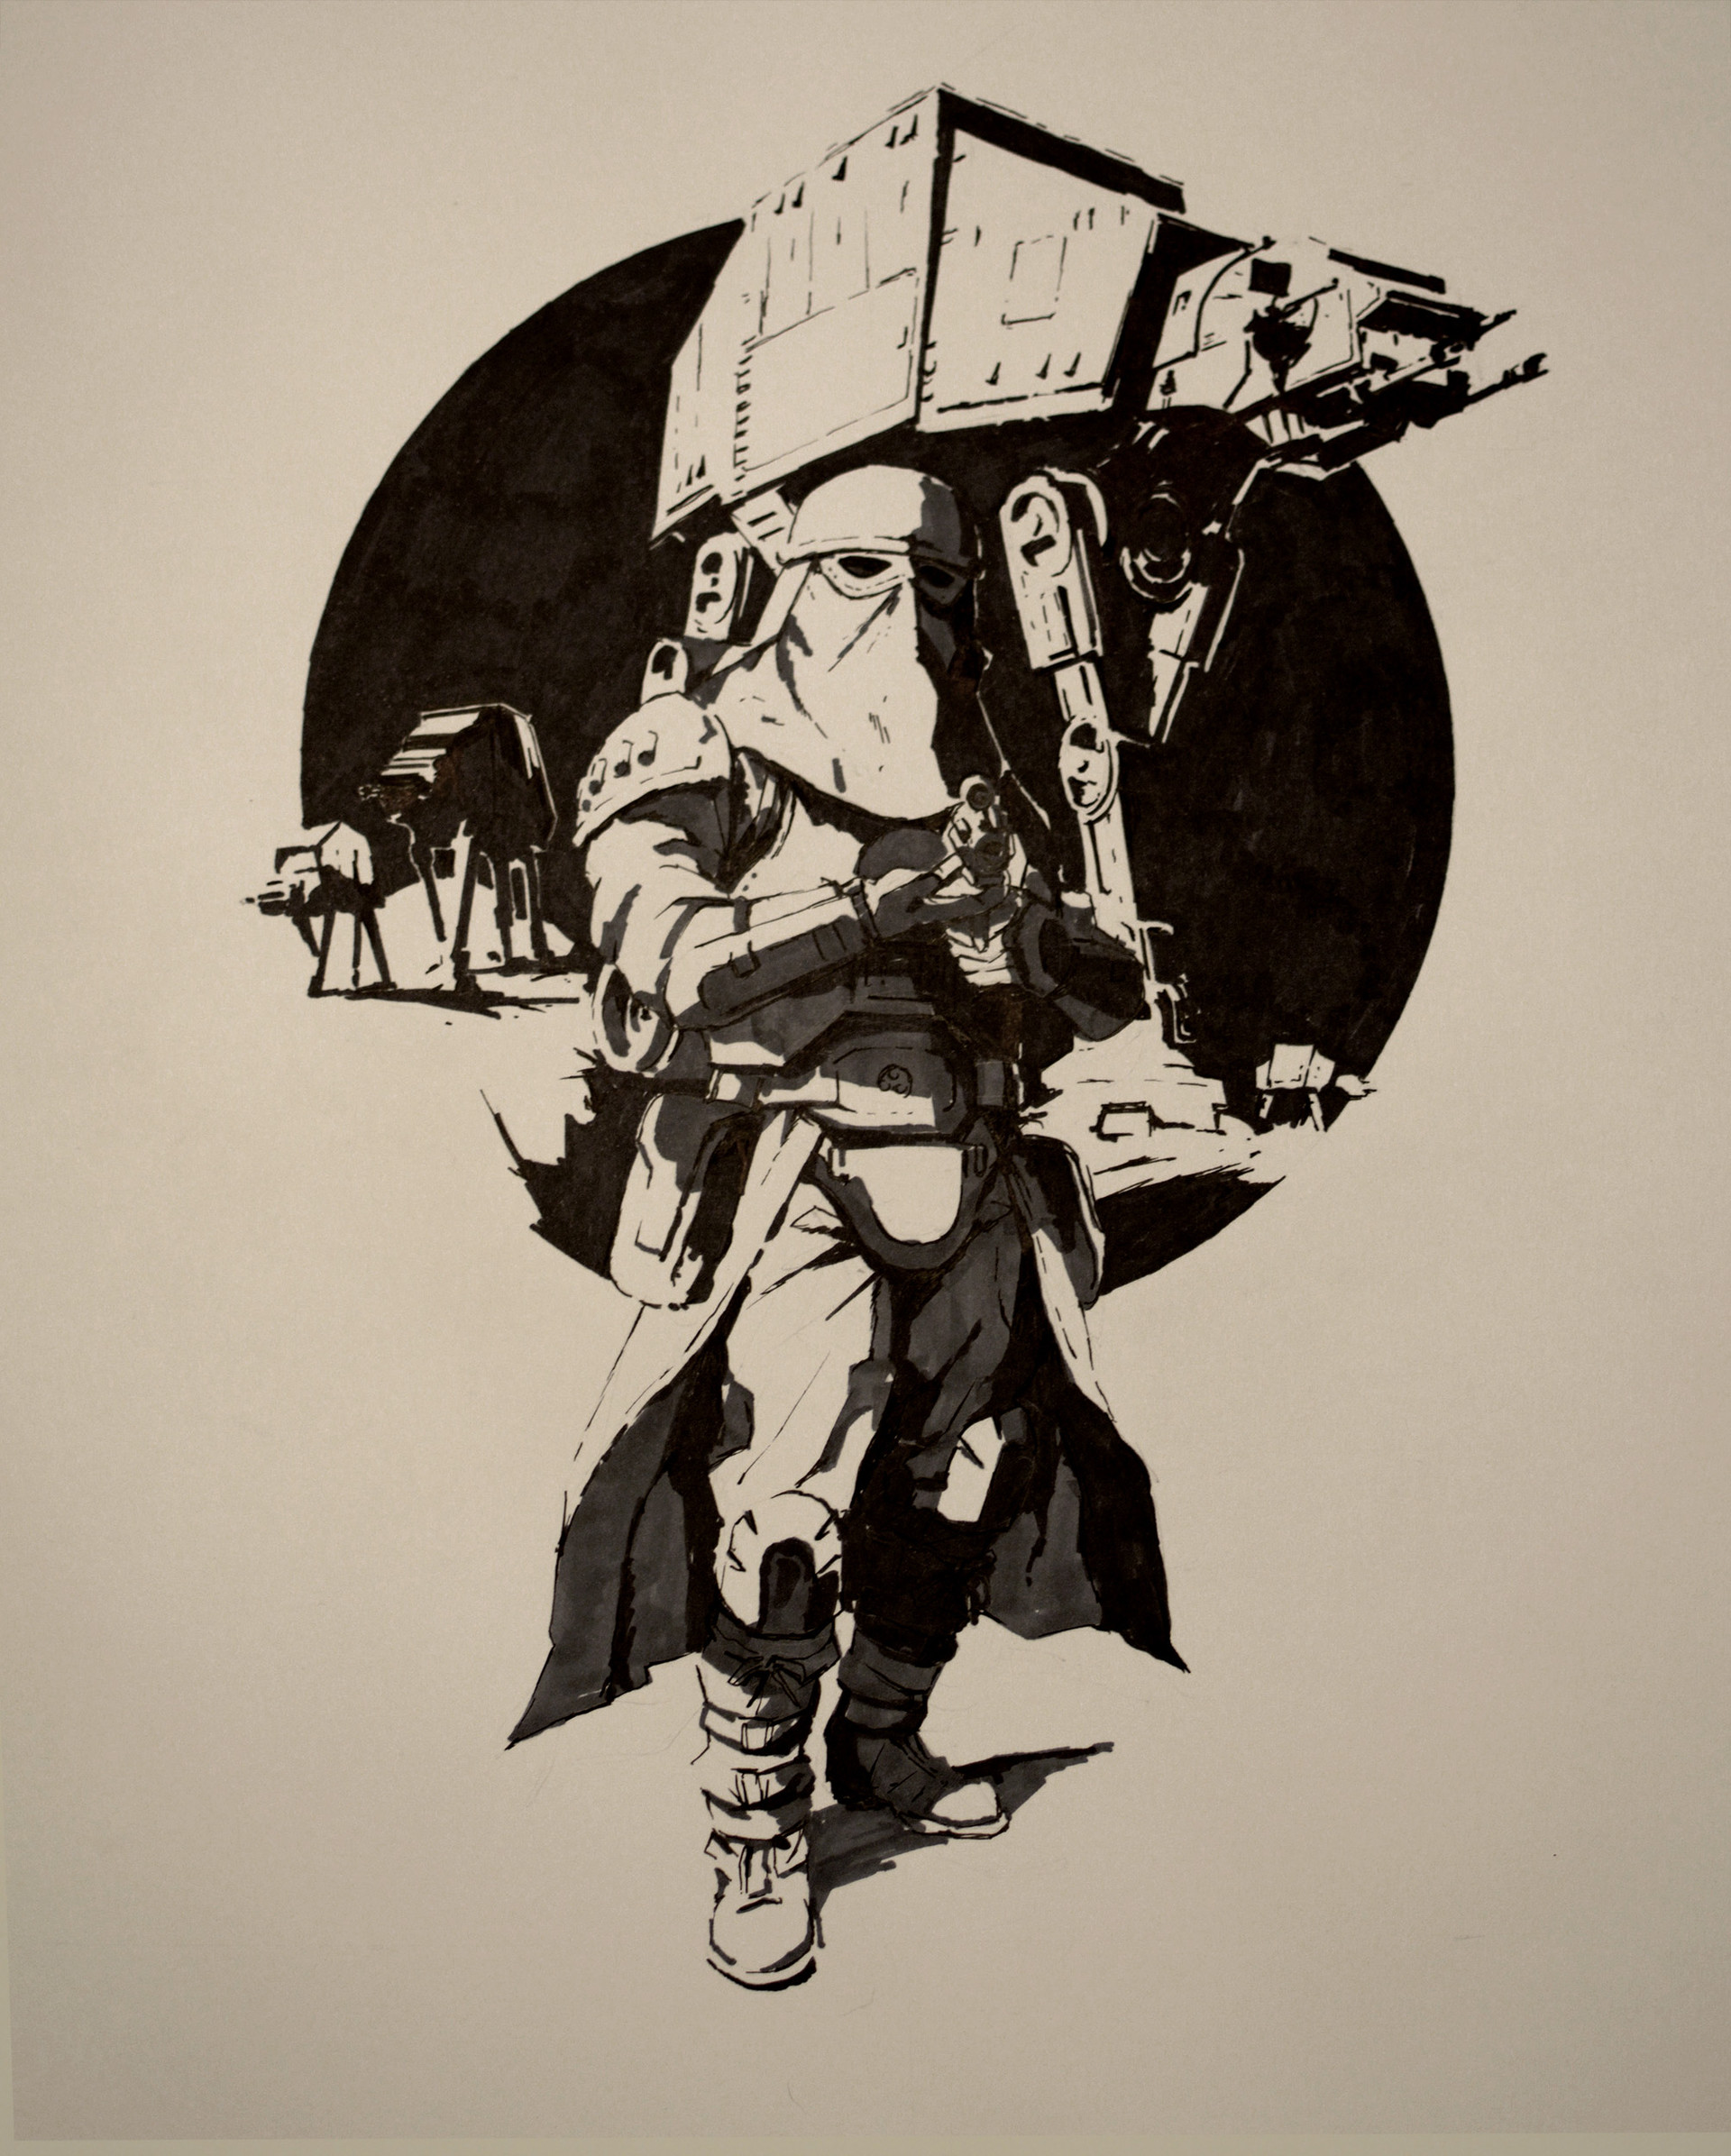 Art Illustration: Star Wars Concept Art And Illustrations II